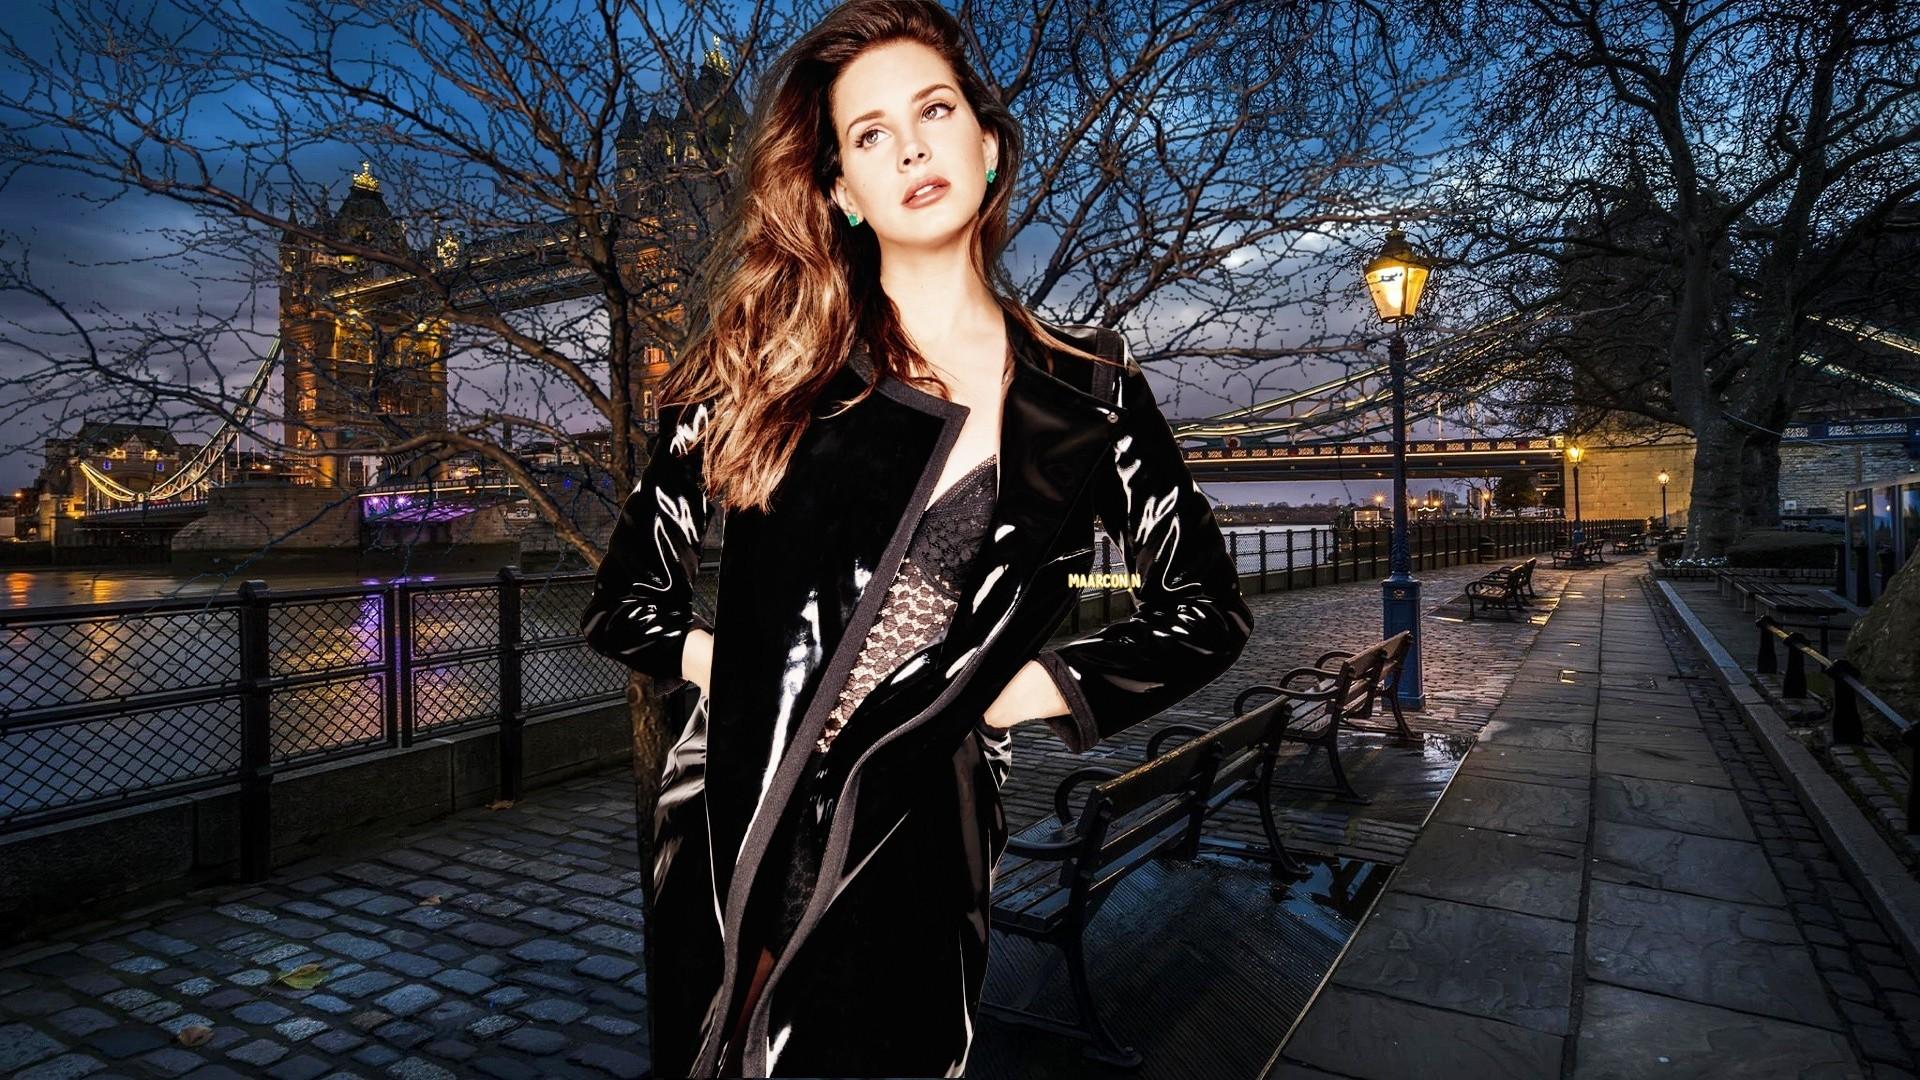 Lana Del Rey Wallpaper